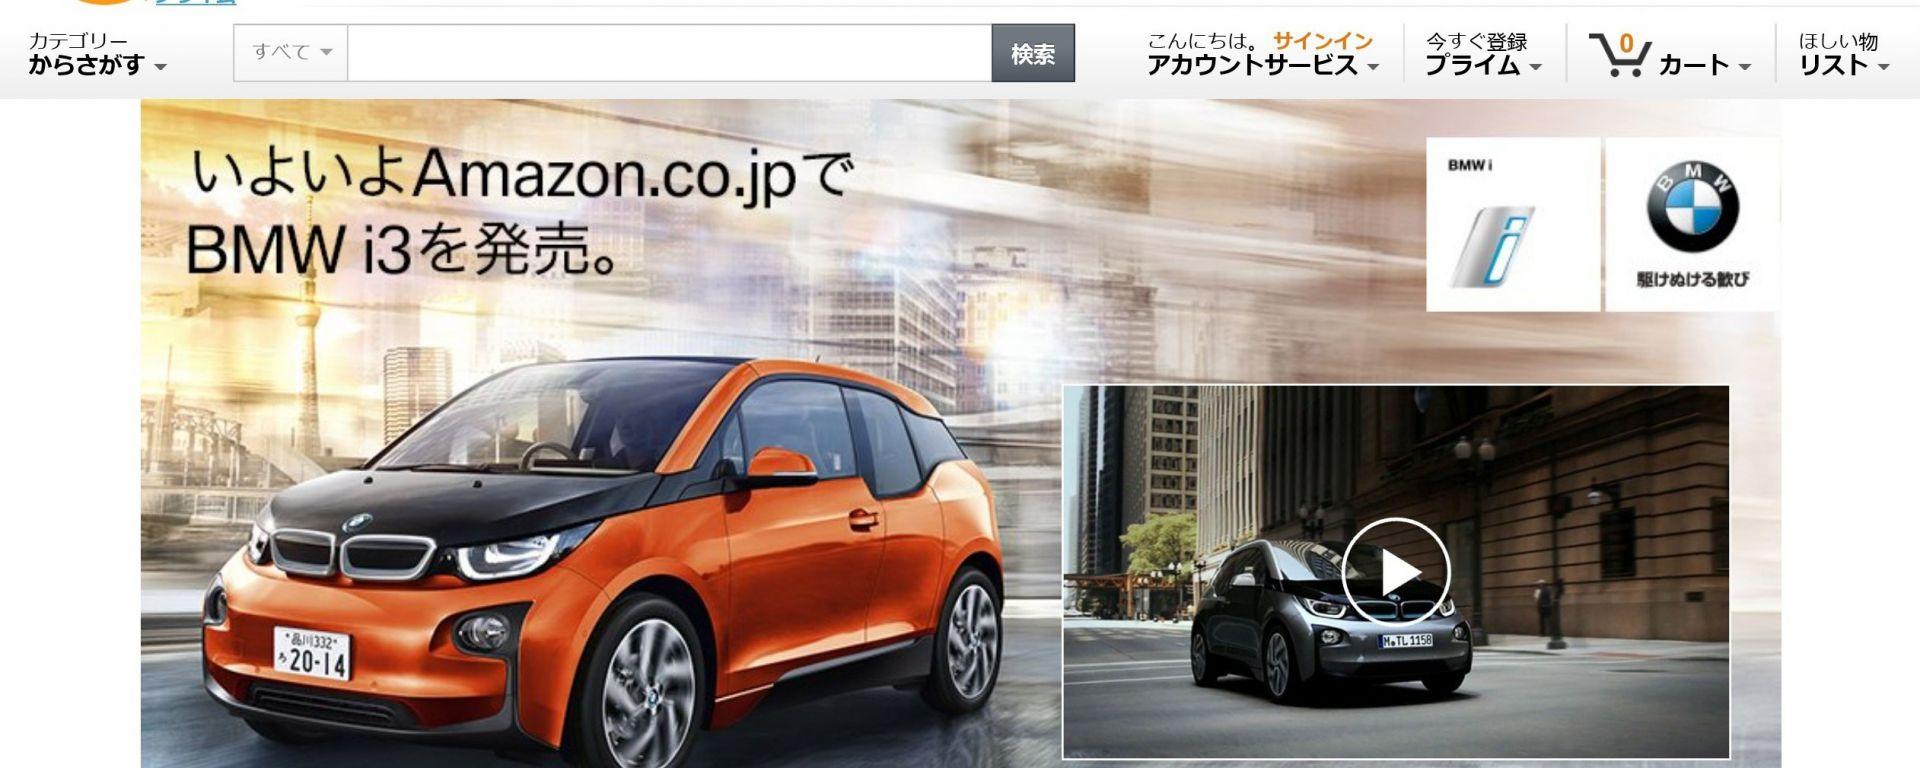 BMW i3: in Giappone è su Amazon